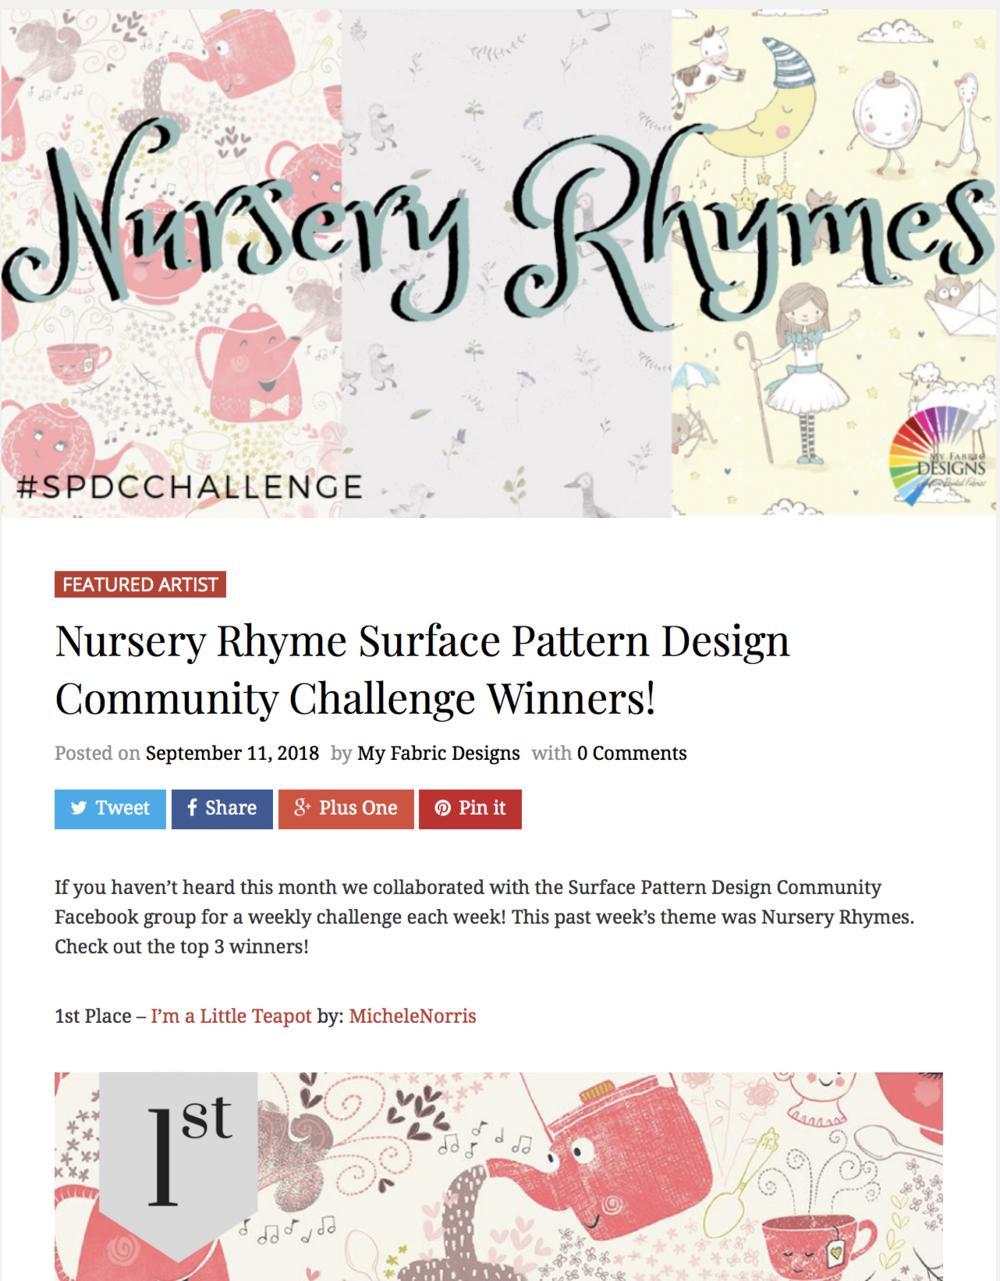 My Fabric Design Featured Artist